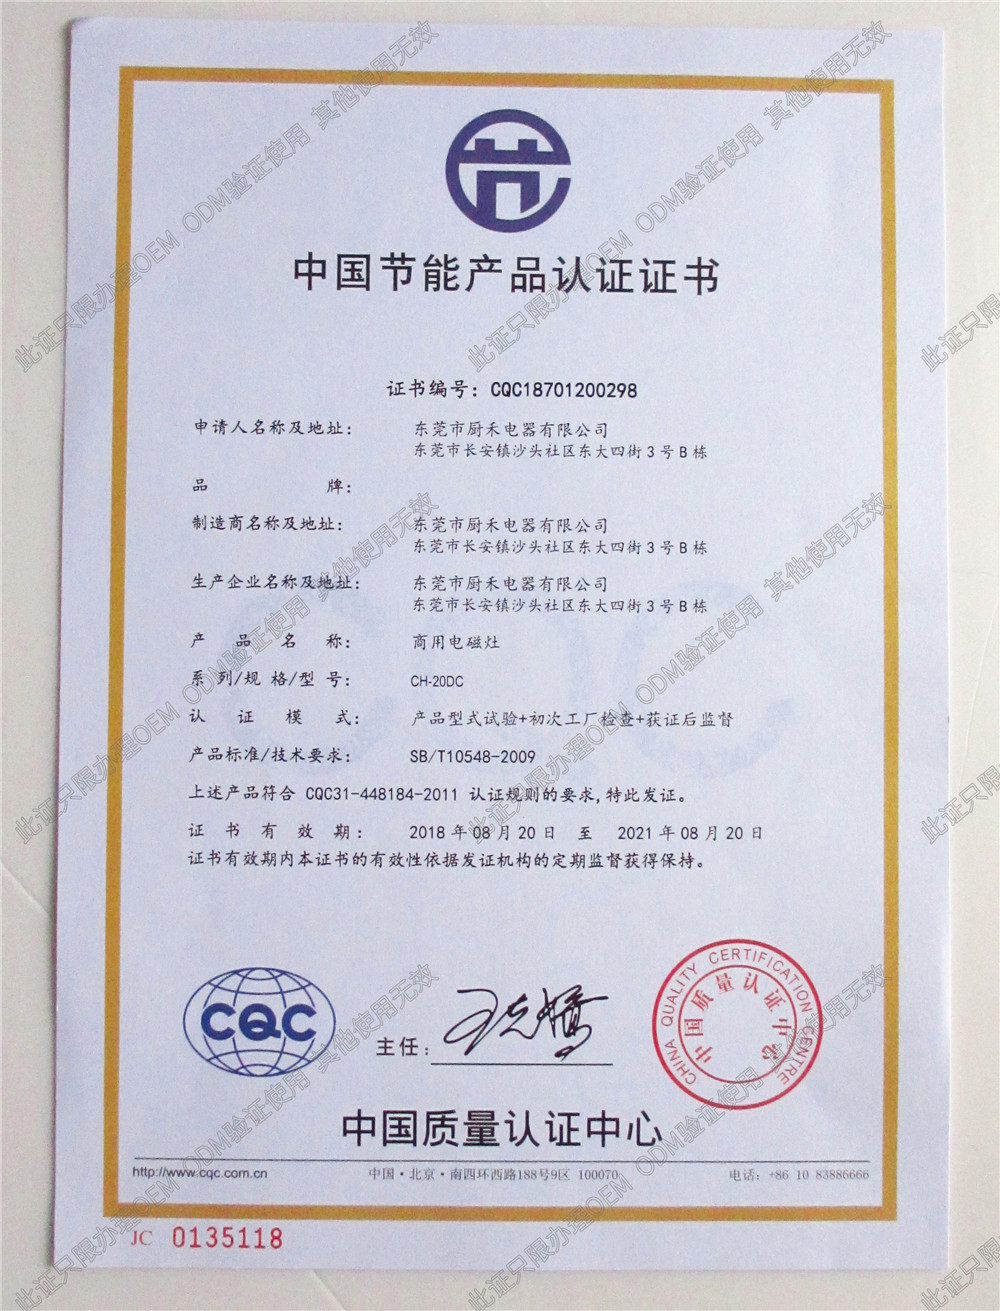 <b>中国节能产品认证试验报告</b>